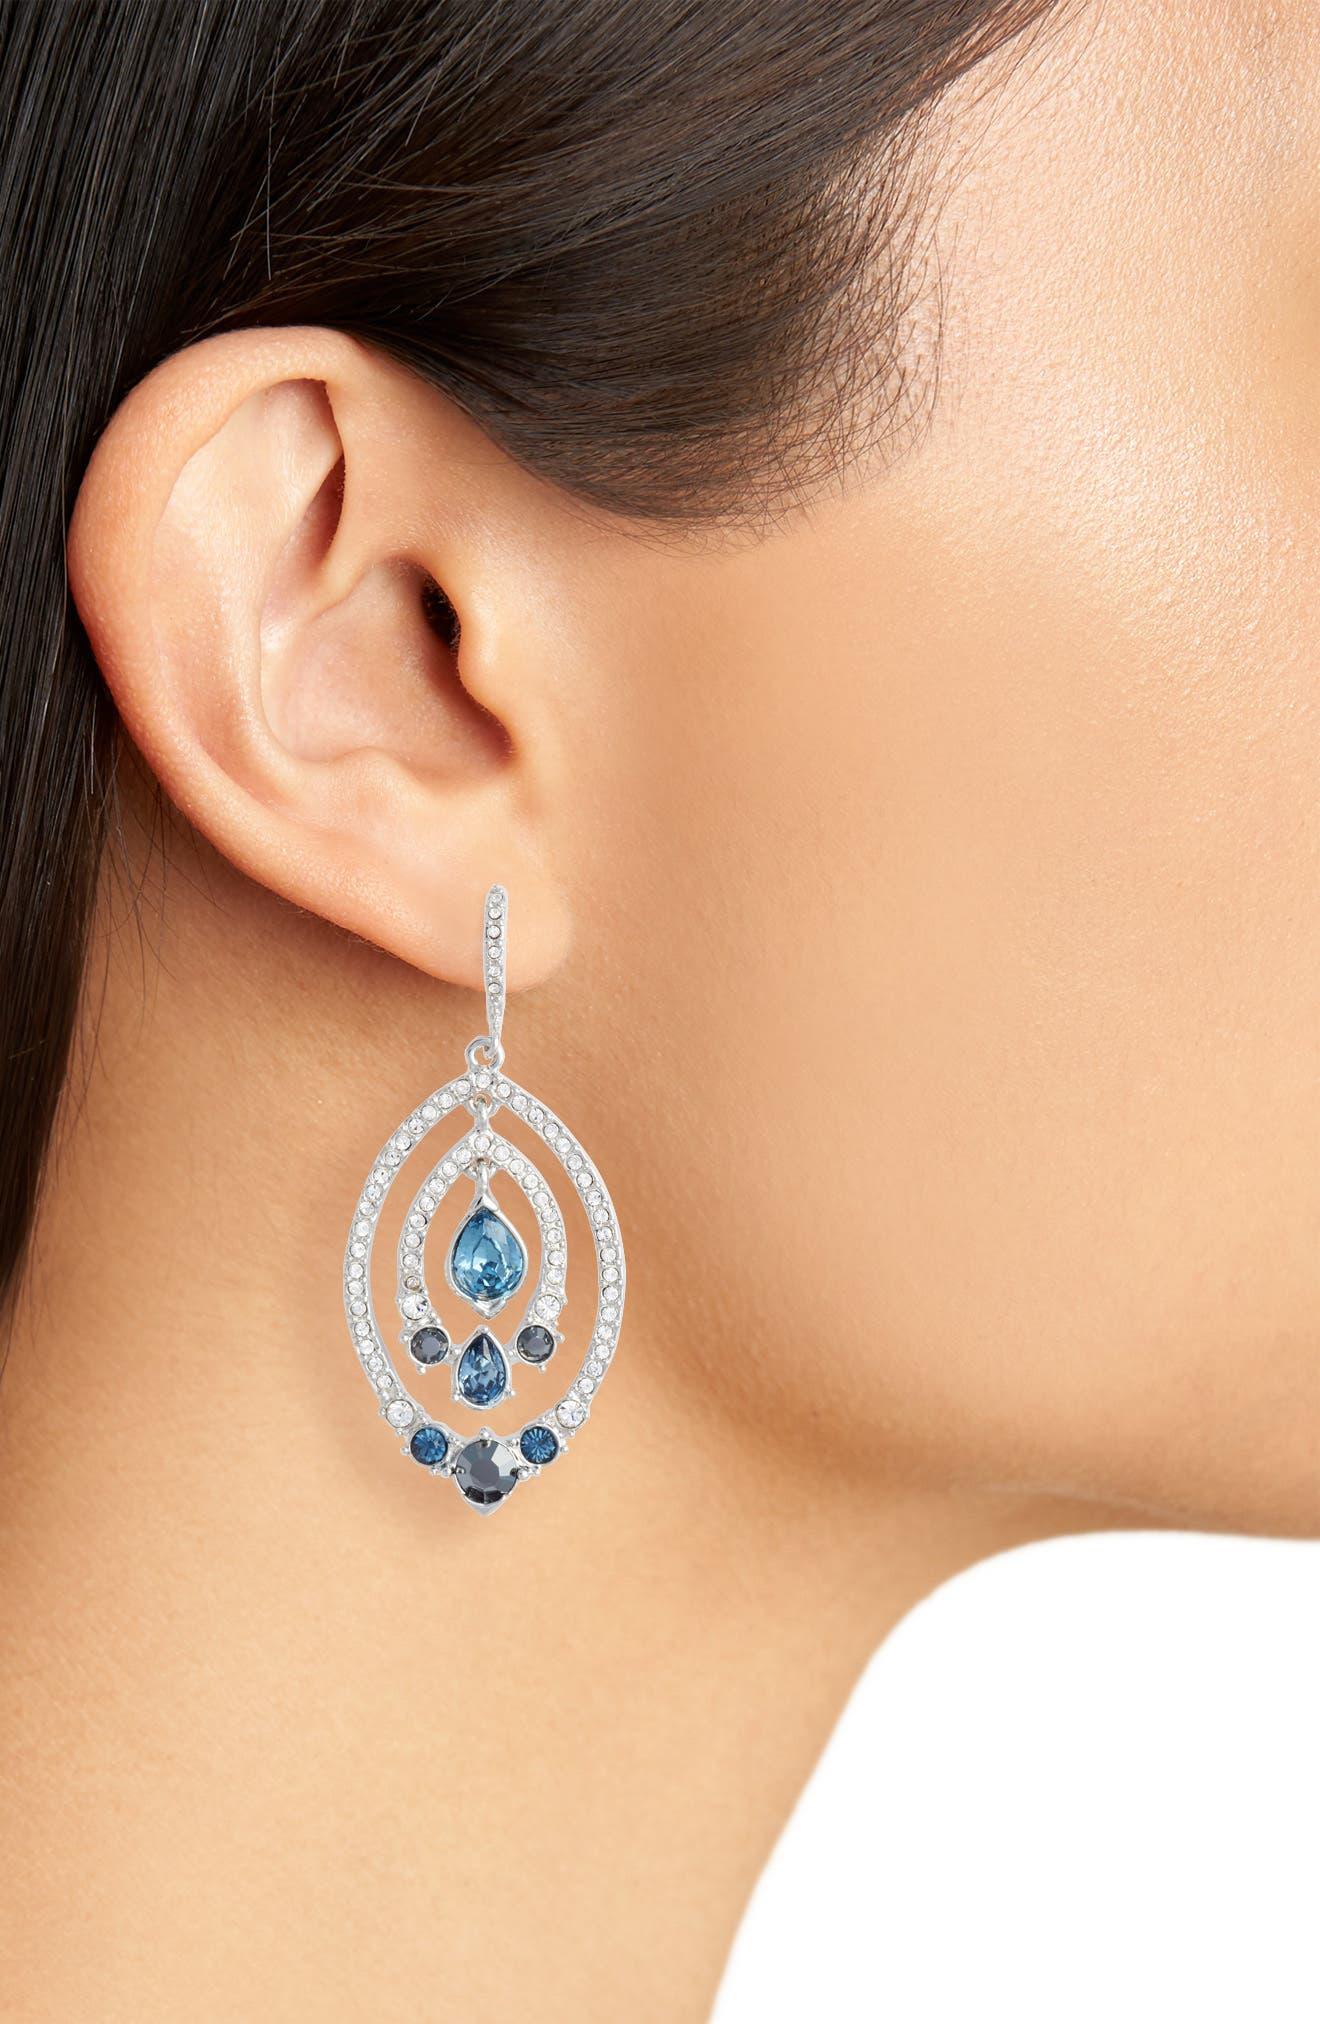 Orbiting Drop earrings,                             Alternate thumbnail 2, color,                             Silver/ Crystal/ Blue Multi